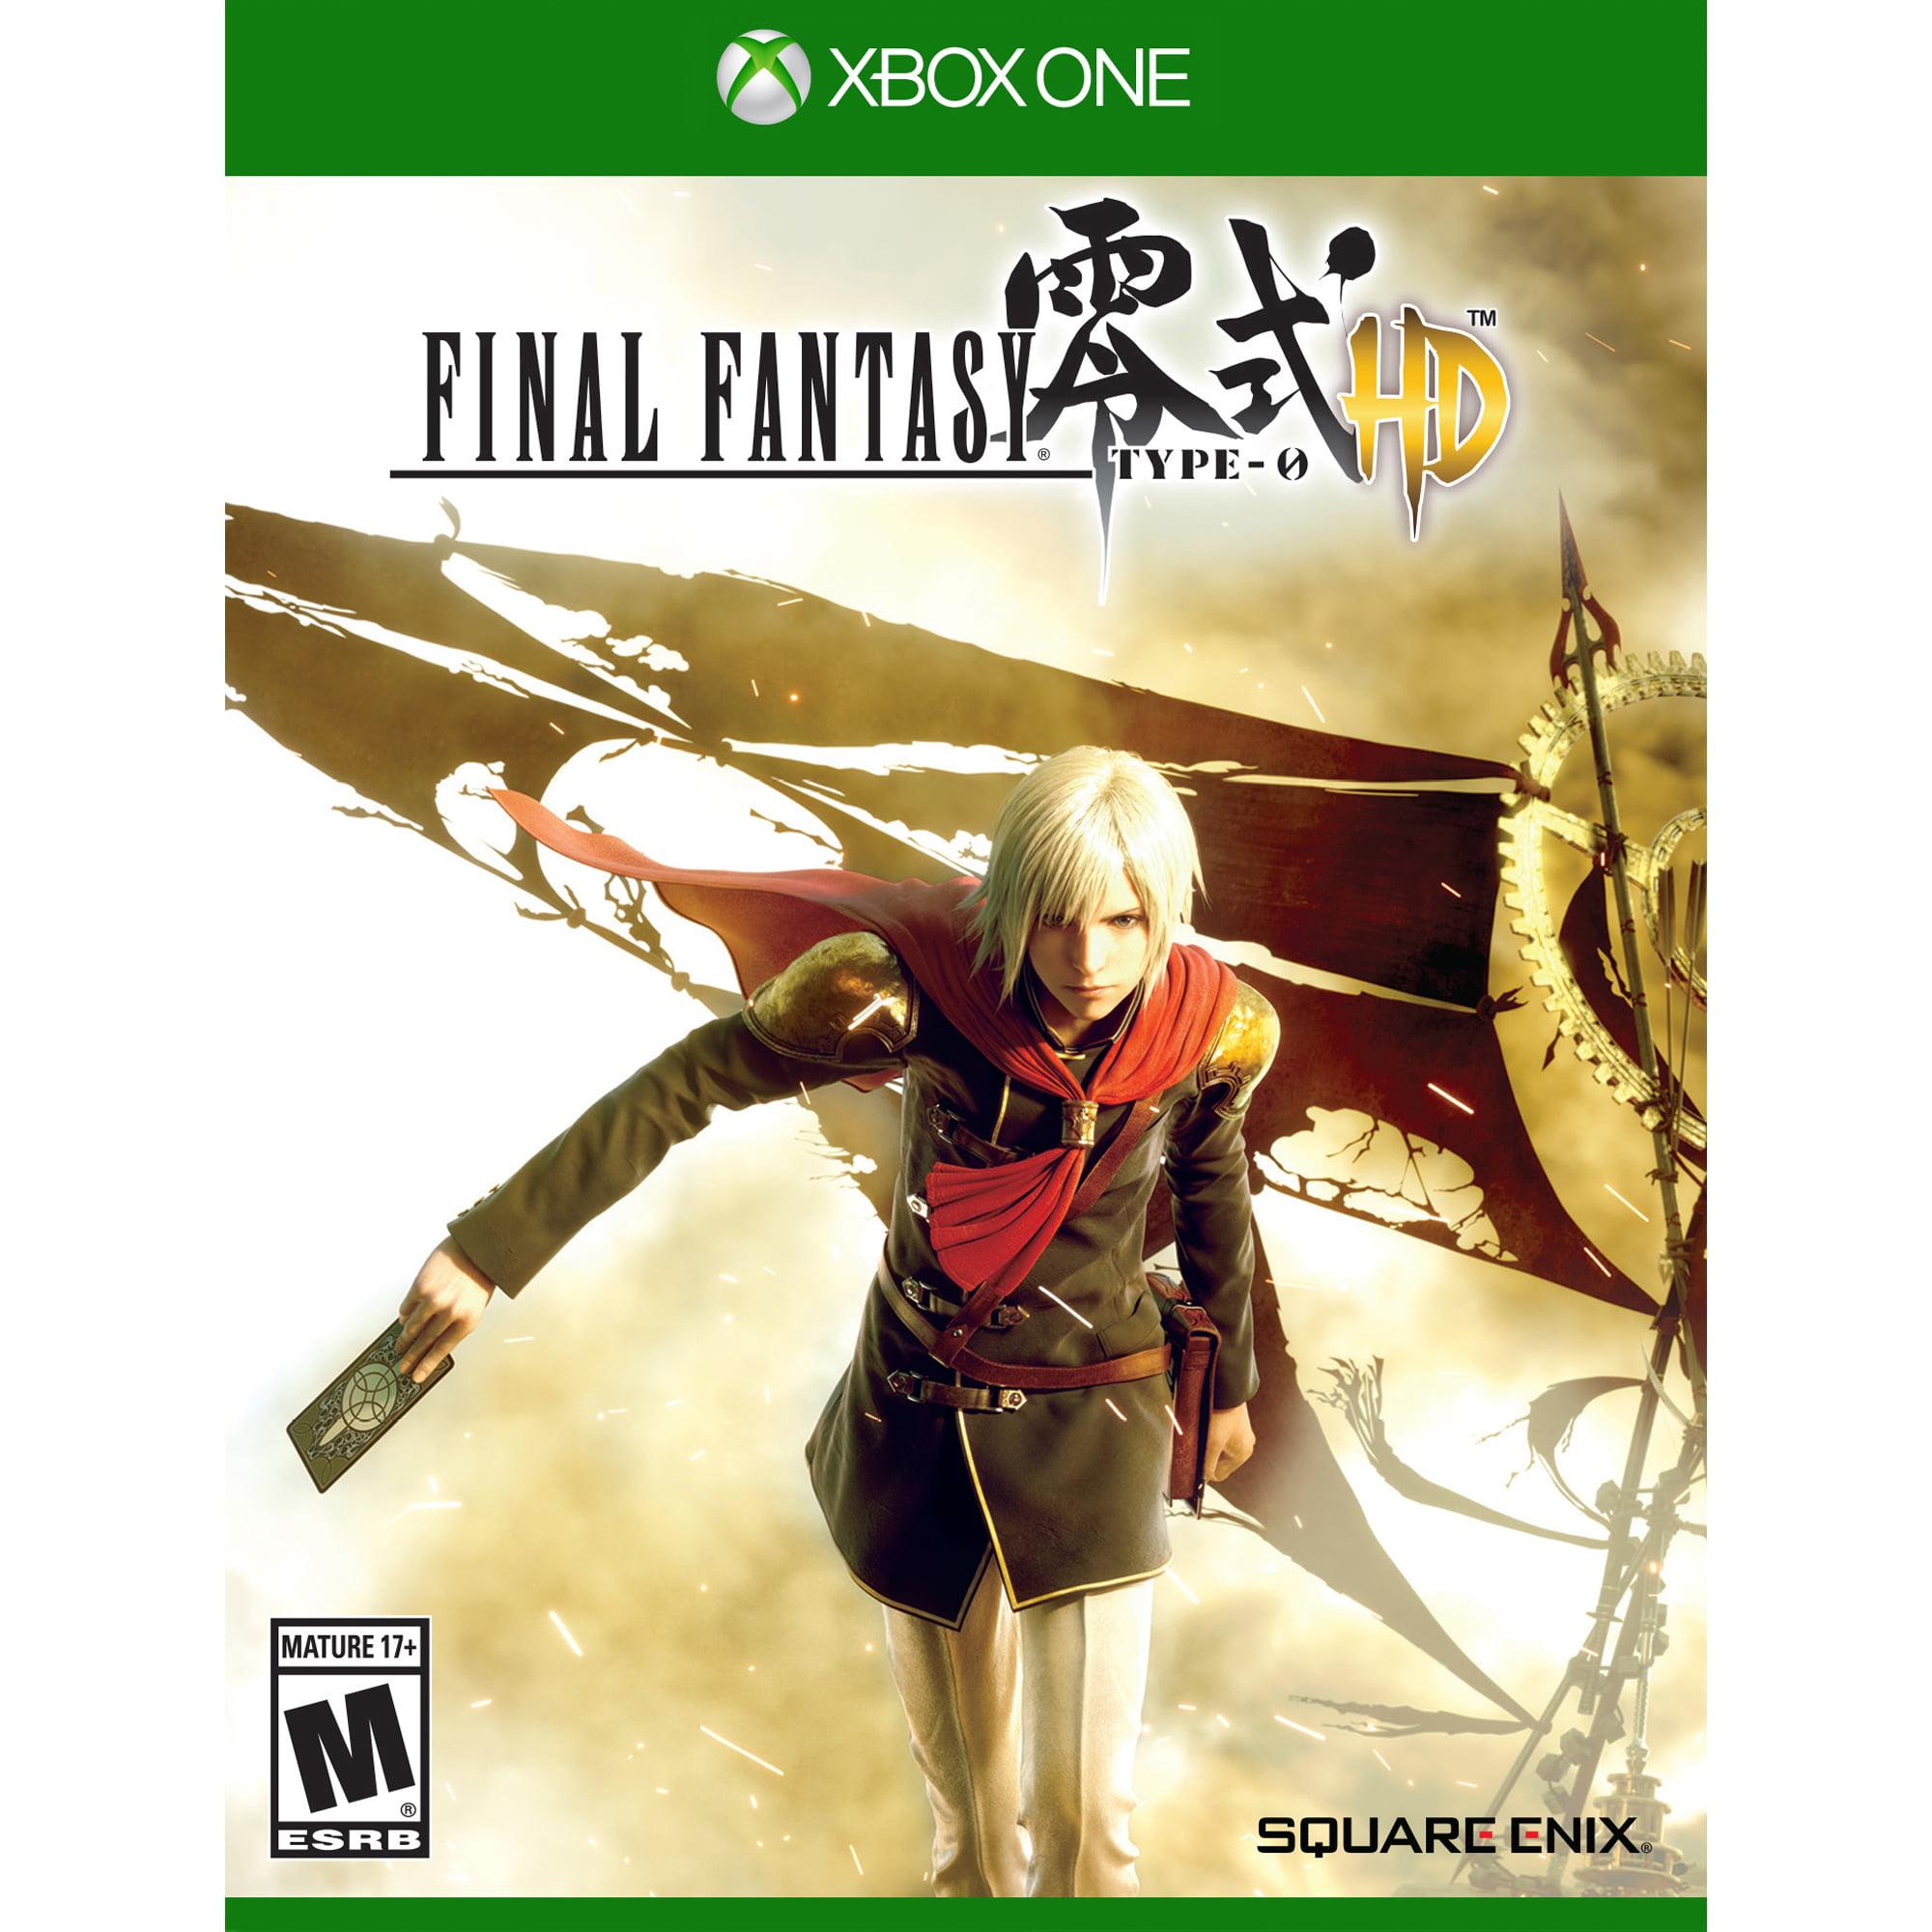 Final Fantasy Type-0 HD (Xbox One)